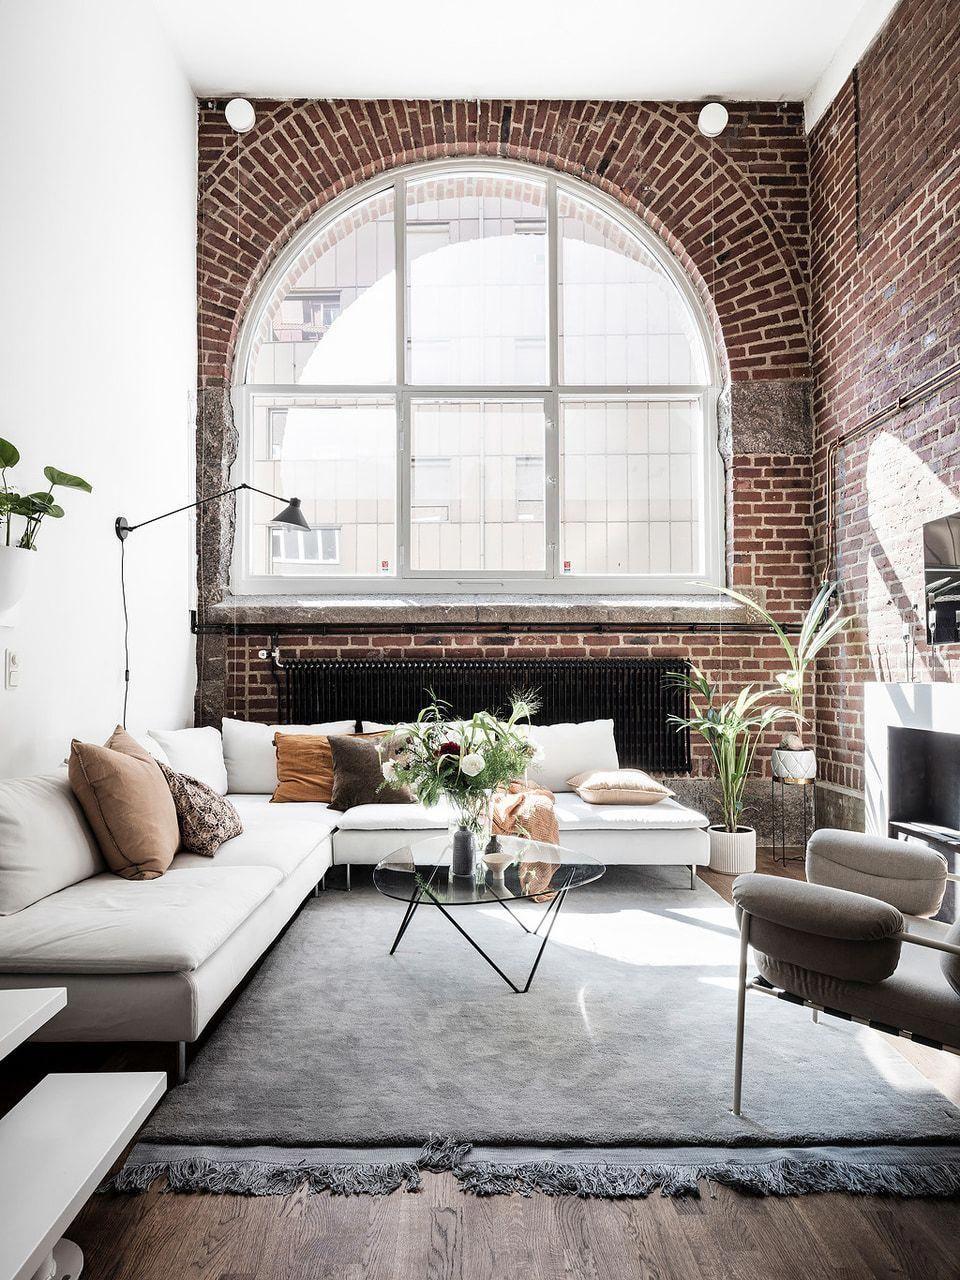 Living Room Interior Design Exposed Brick Wall Big Grid Window White Sofa Modern Simple Neu Living Room White Trendy Living Rooms Living Room Diy